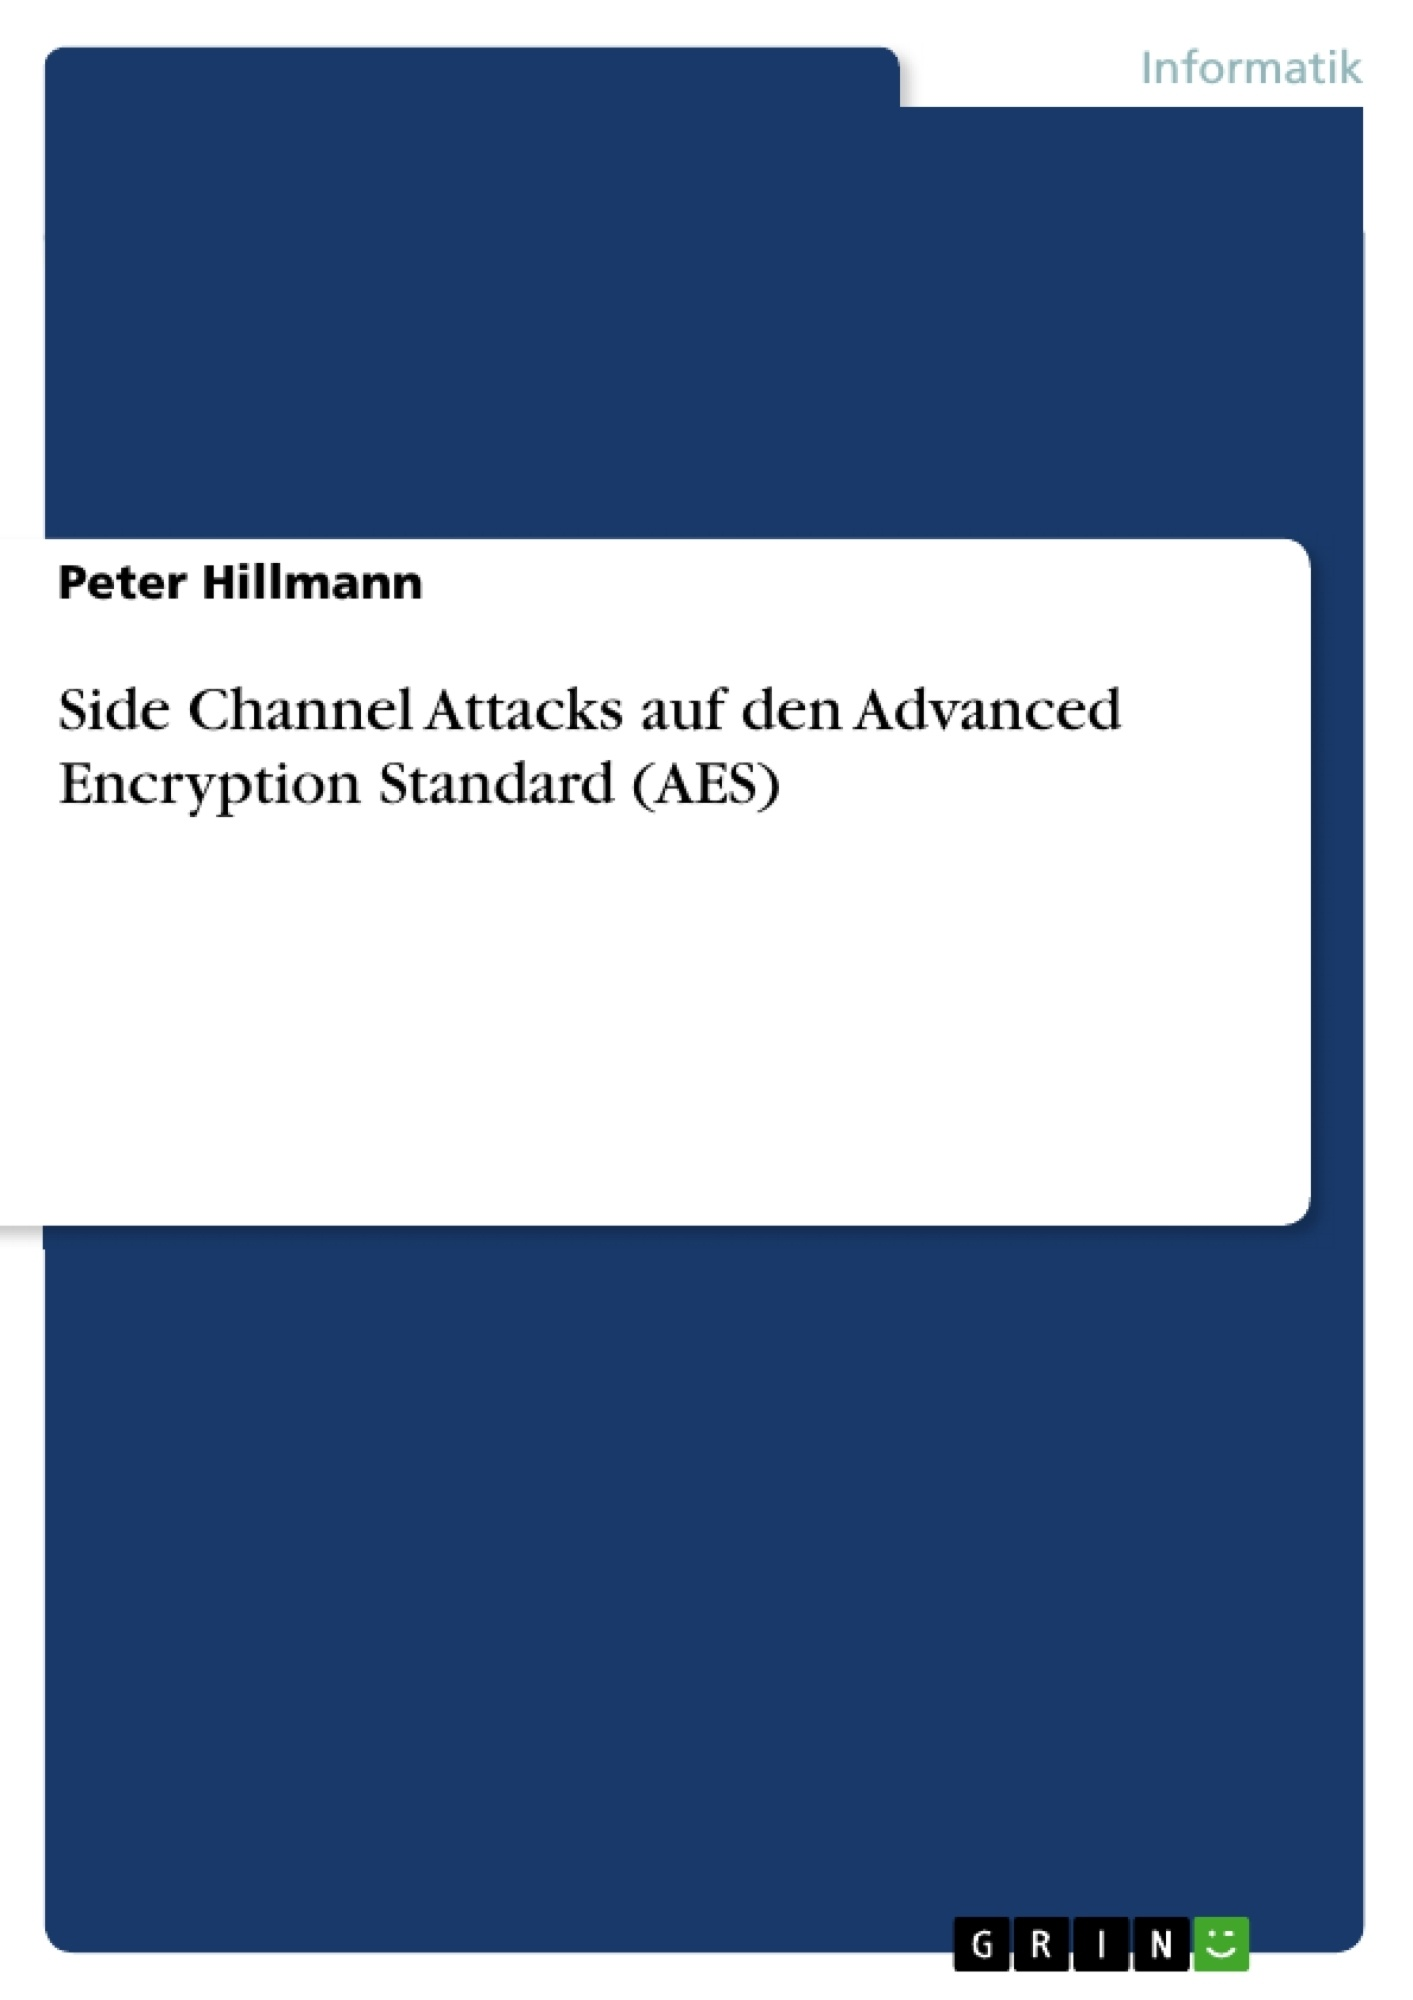 Titel: Side Channel Attacks auf den Advanced Encryption Standard (AES)